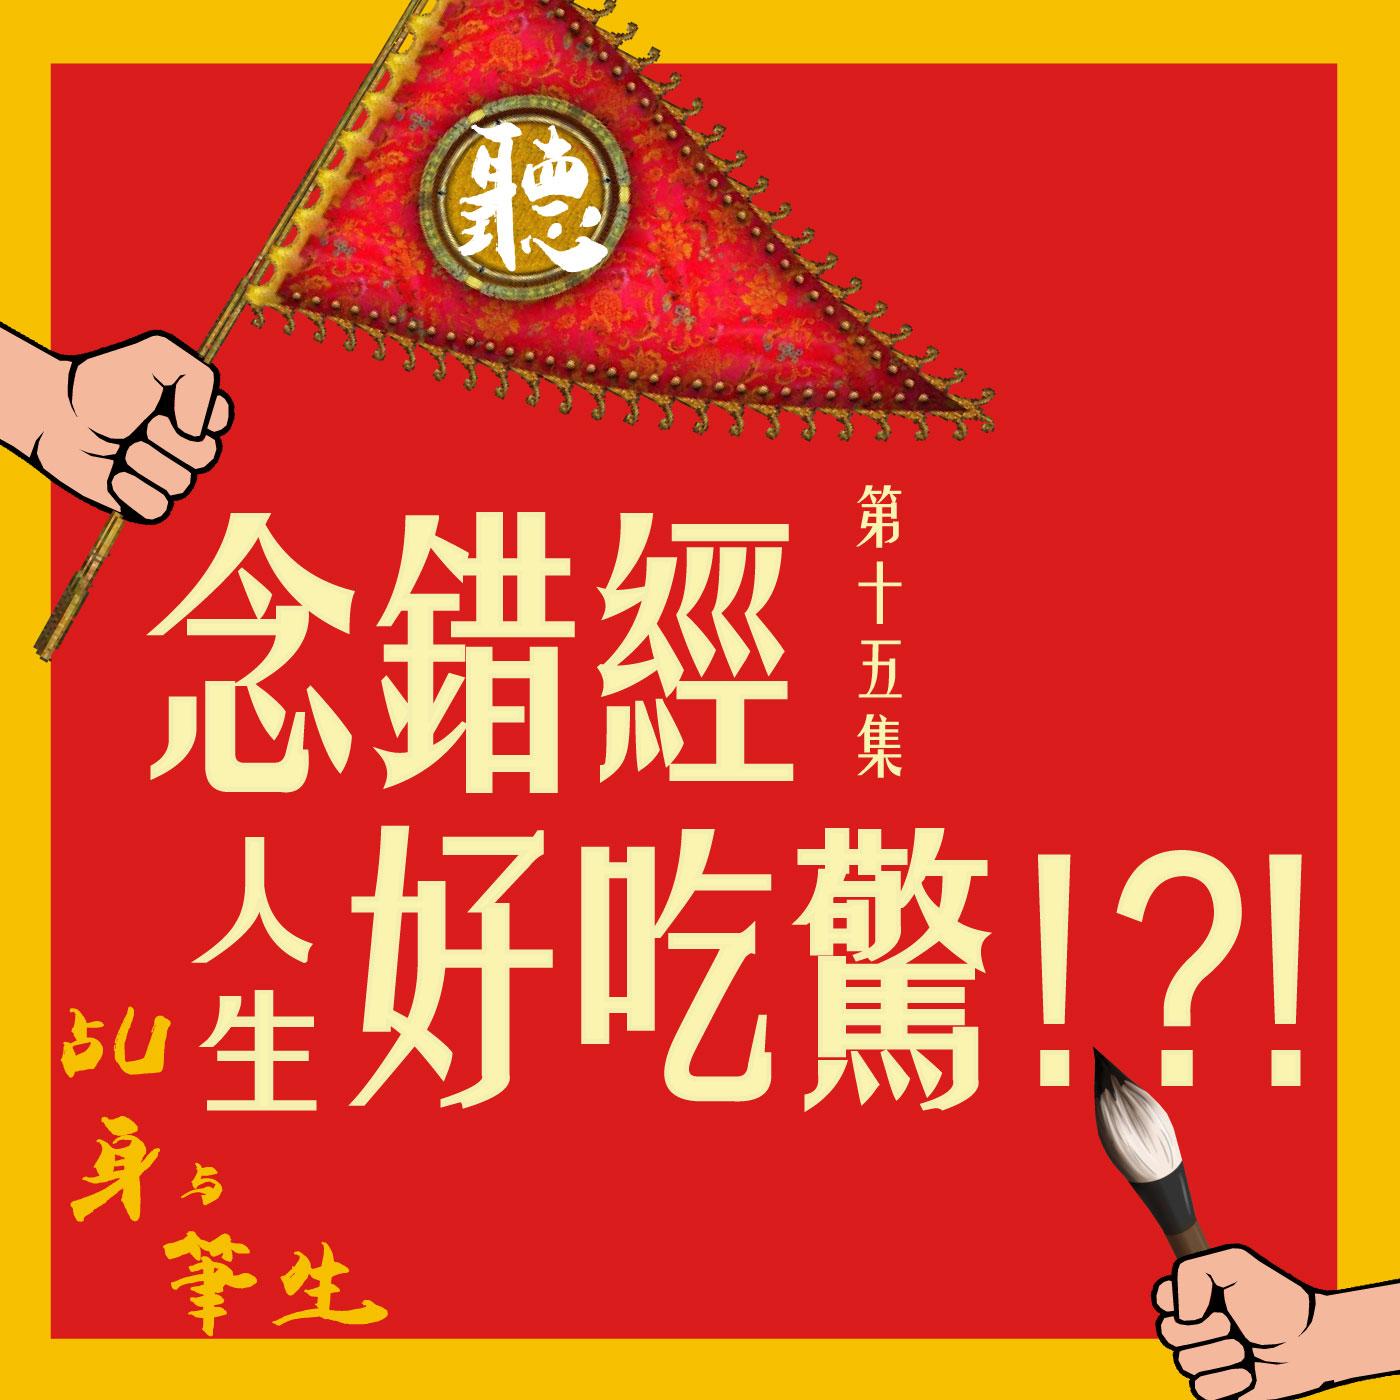 S1 EP15 - 念錯經,人生好吃驚!?!